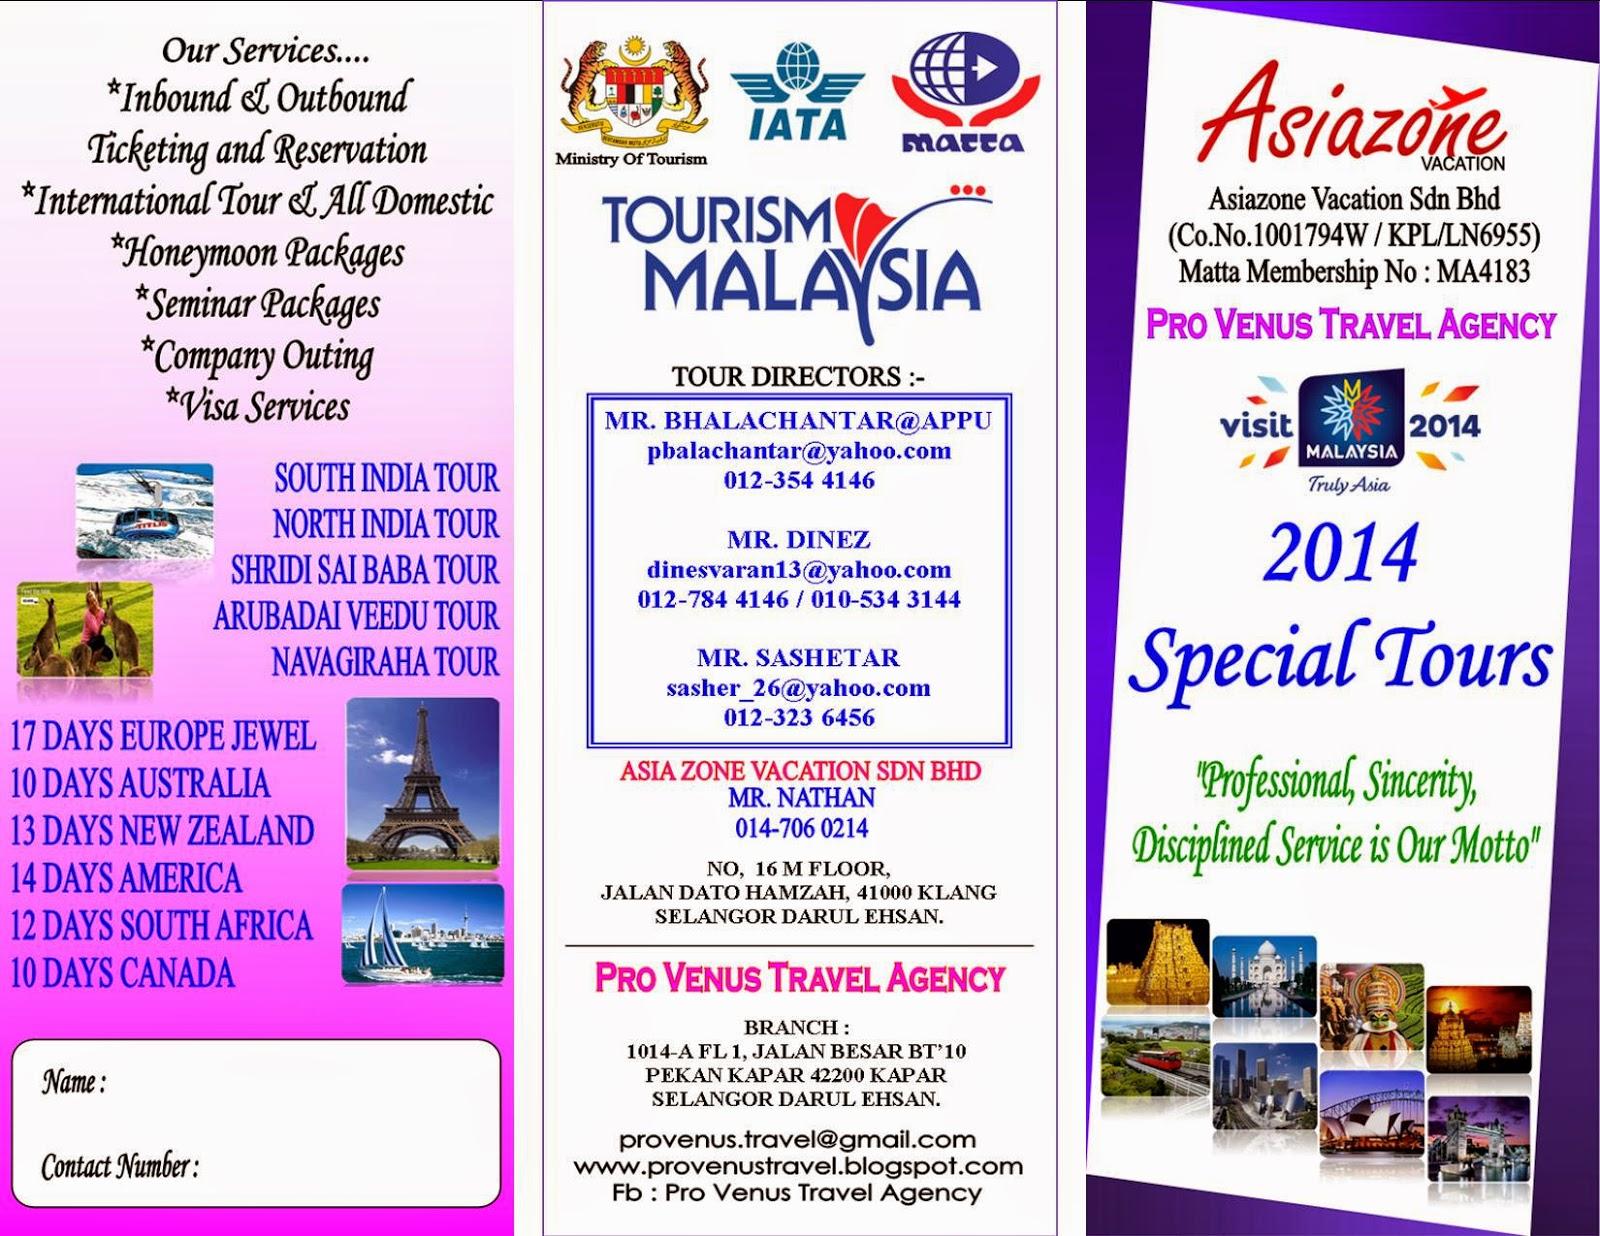 pro venus travel agency 2014 special tour brochure